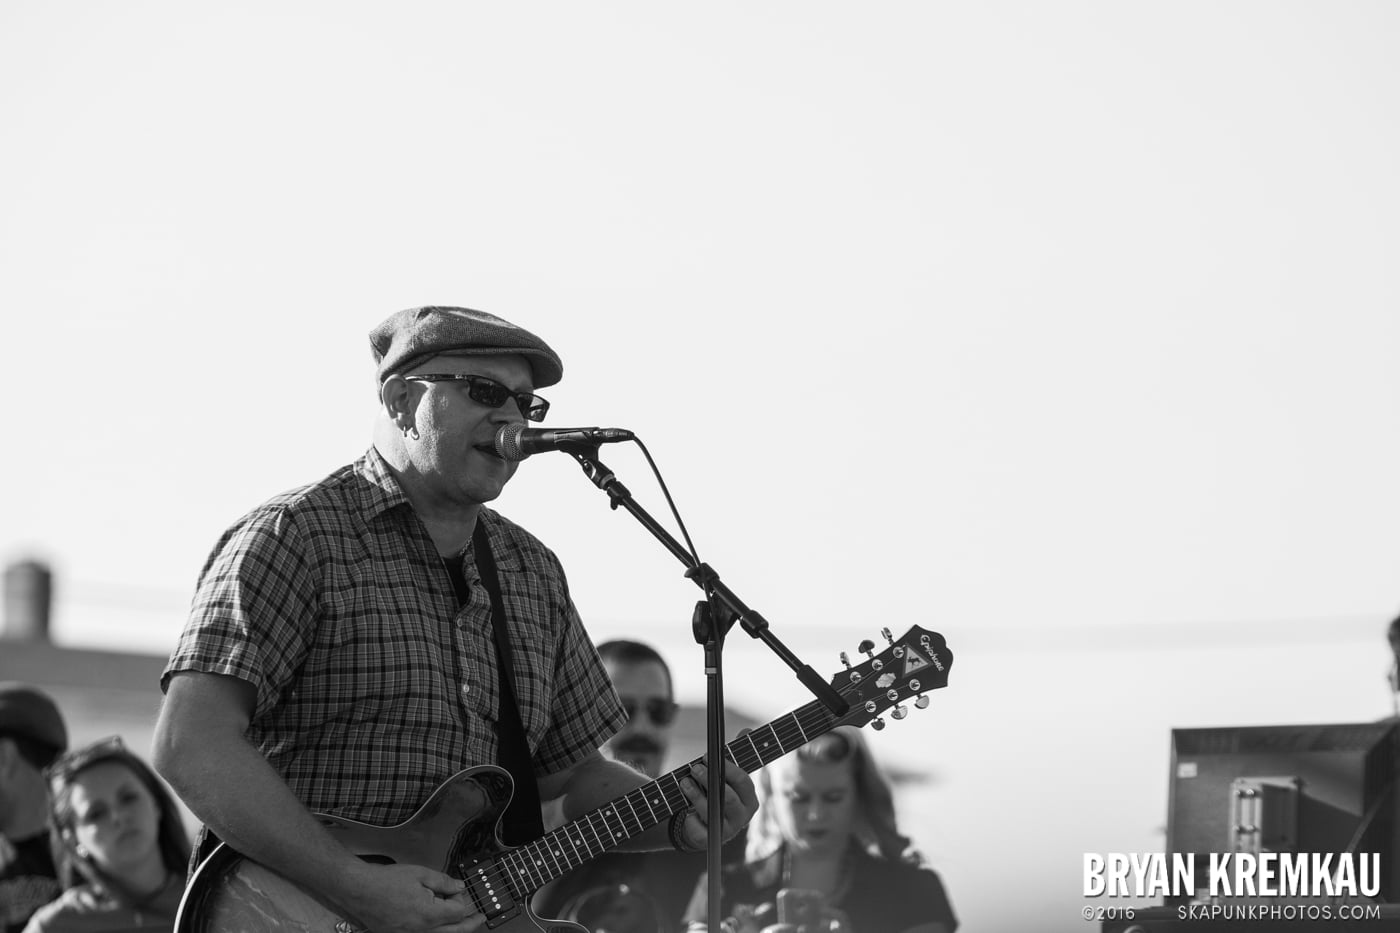 Swingin' Utters @ Stone Pony Summer Stage, Asbury Park, NJ - 8.15.15 (11)